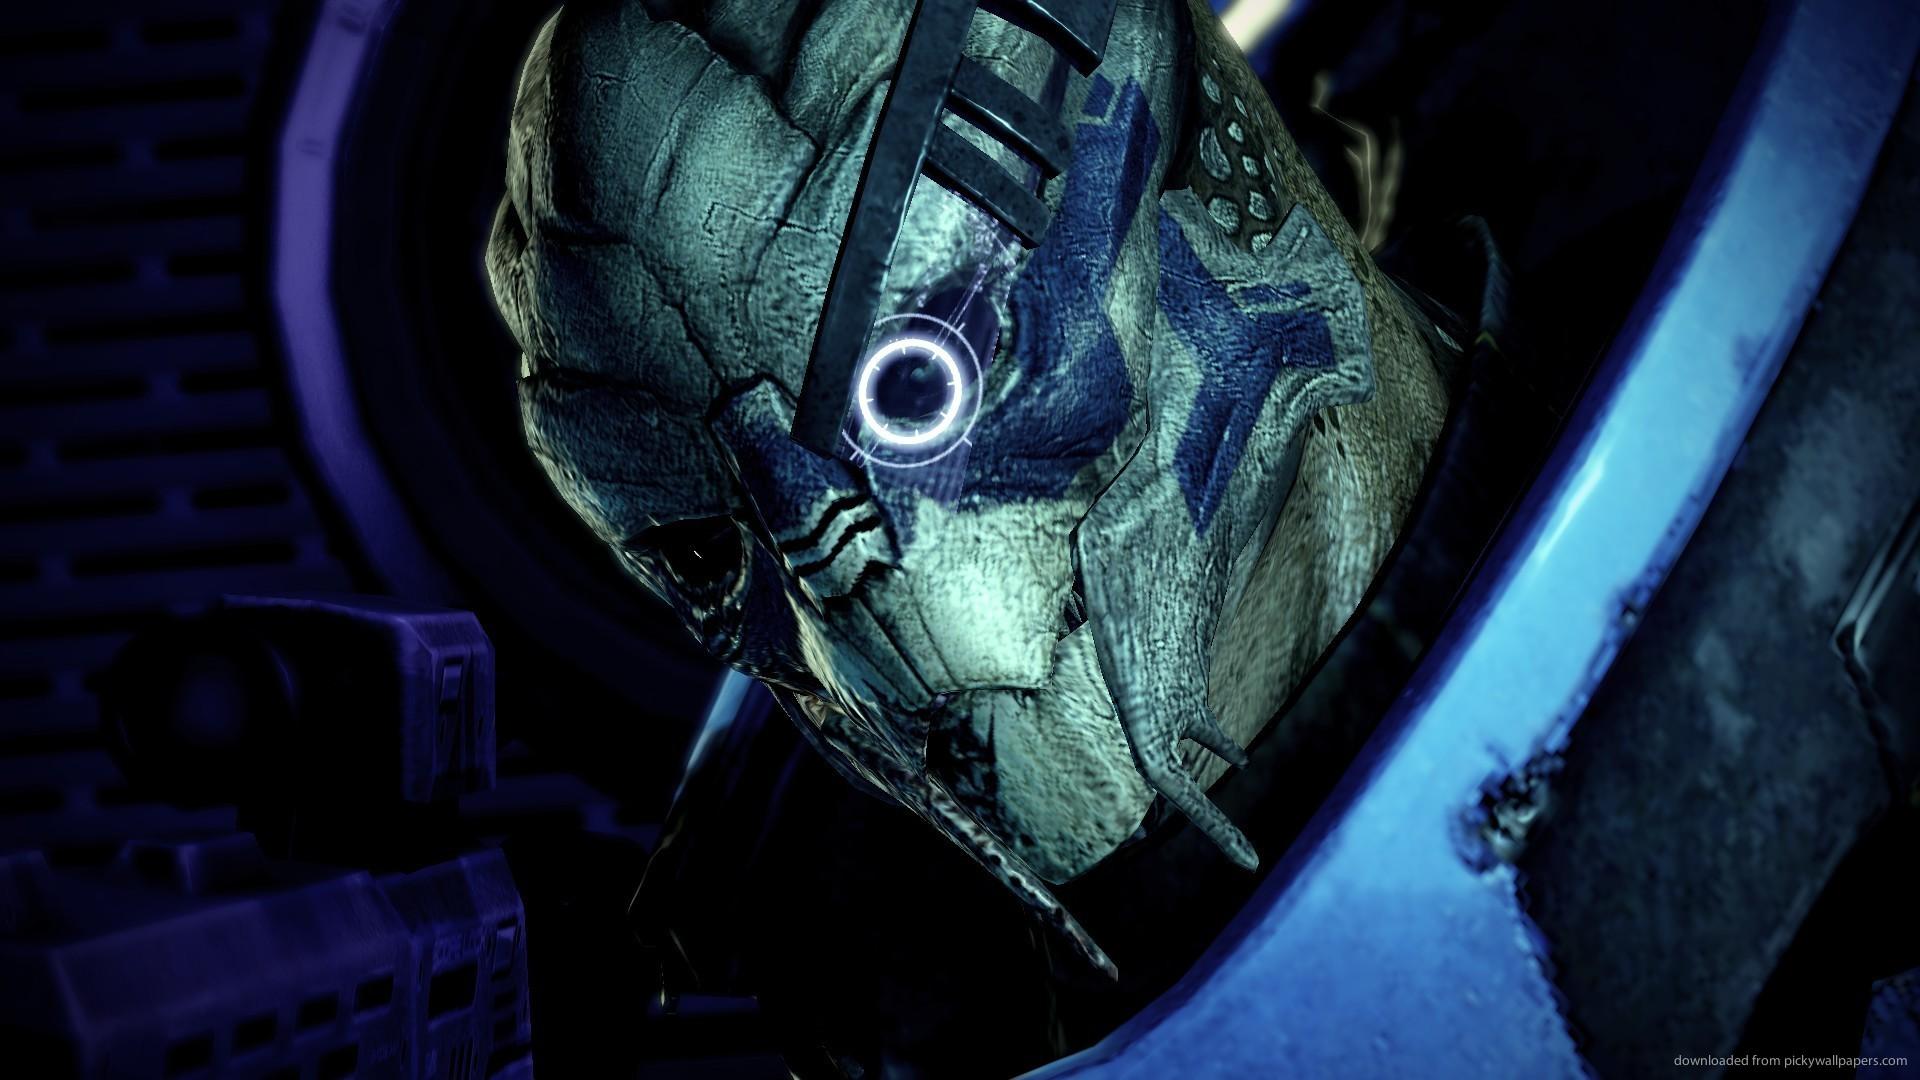 Download 1920x1080 Mass Effect Garrus Portrait Wallpaper 1920x1080